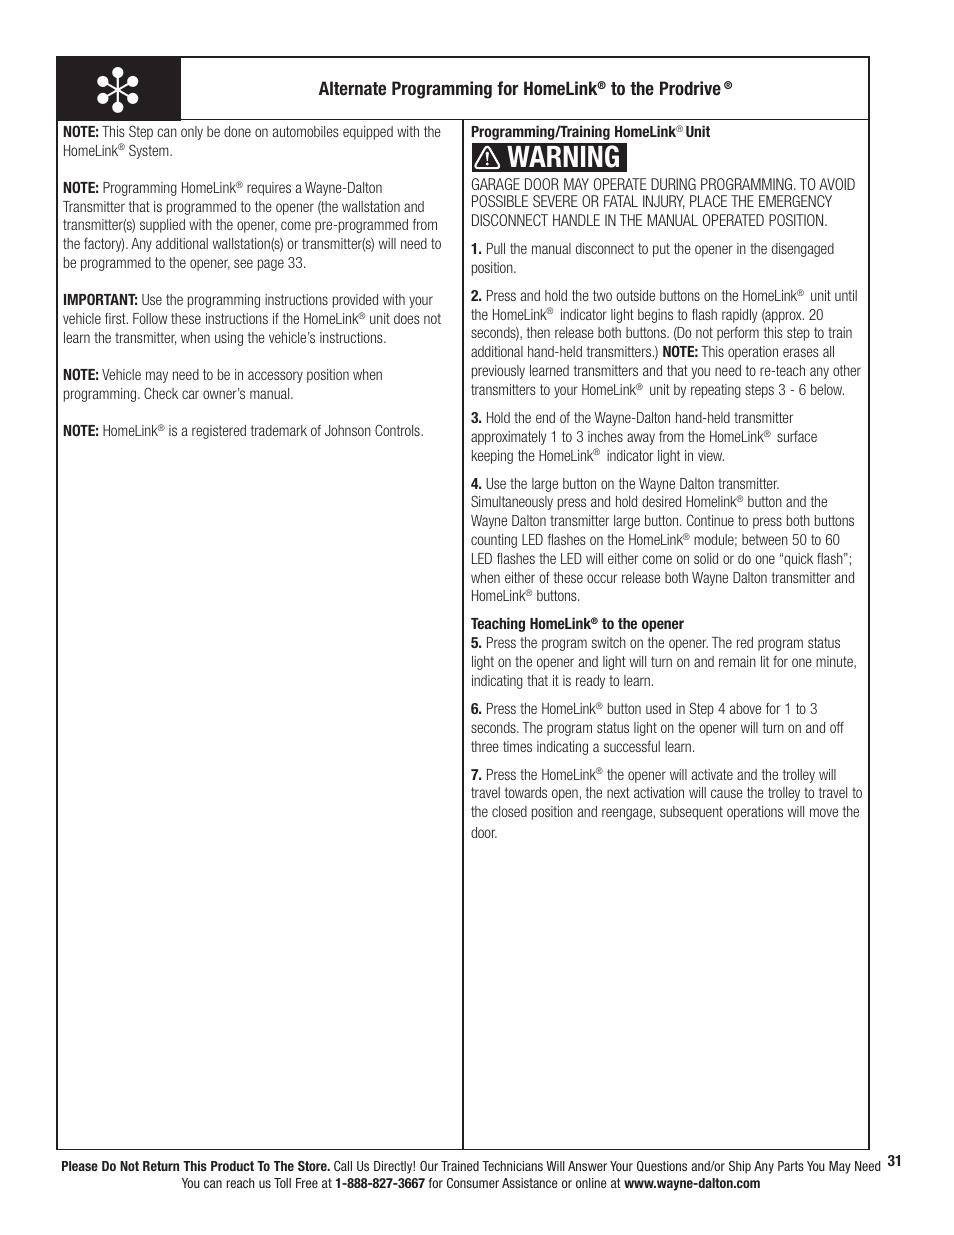 Warning Alternate Programming For Homelink Wayne Dalton Prodrive 3221c Z User Manual Page 37 96